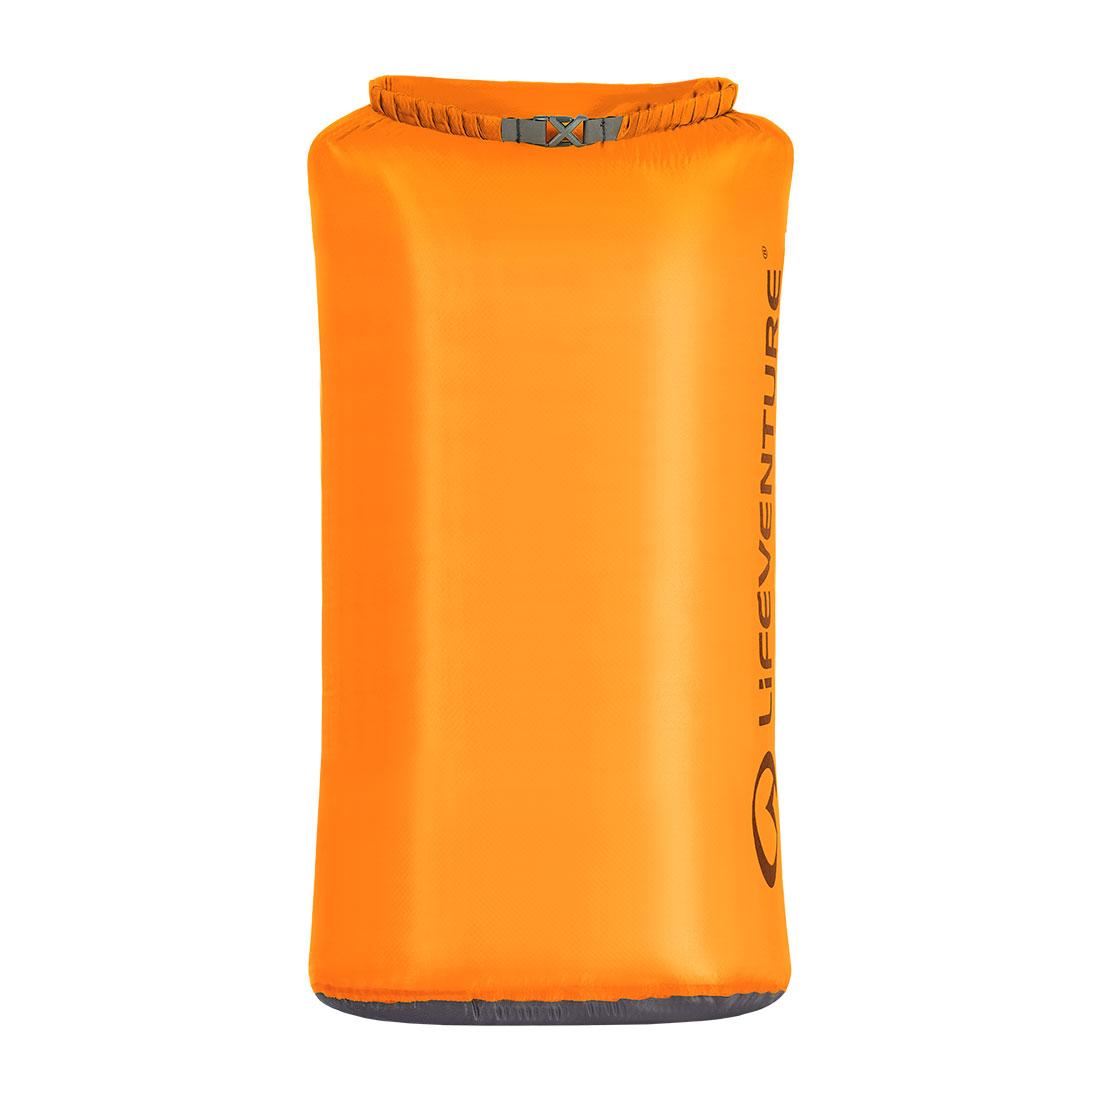 LIFEVENTURE Ultralight Dry Bag 75L